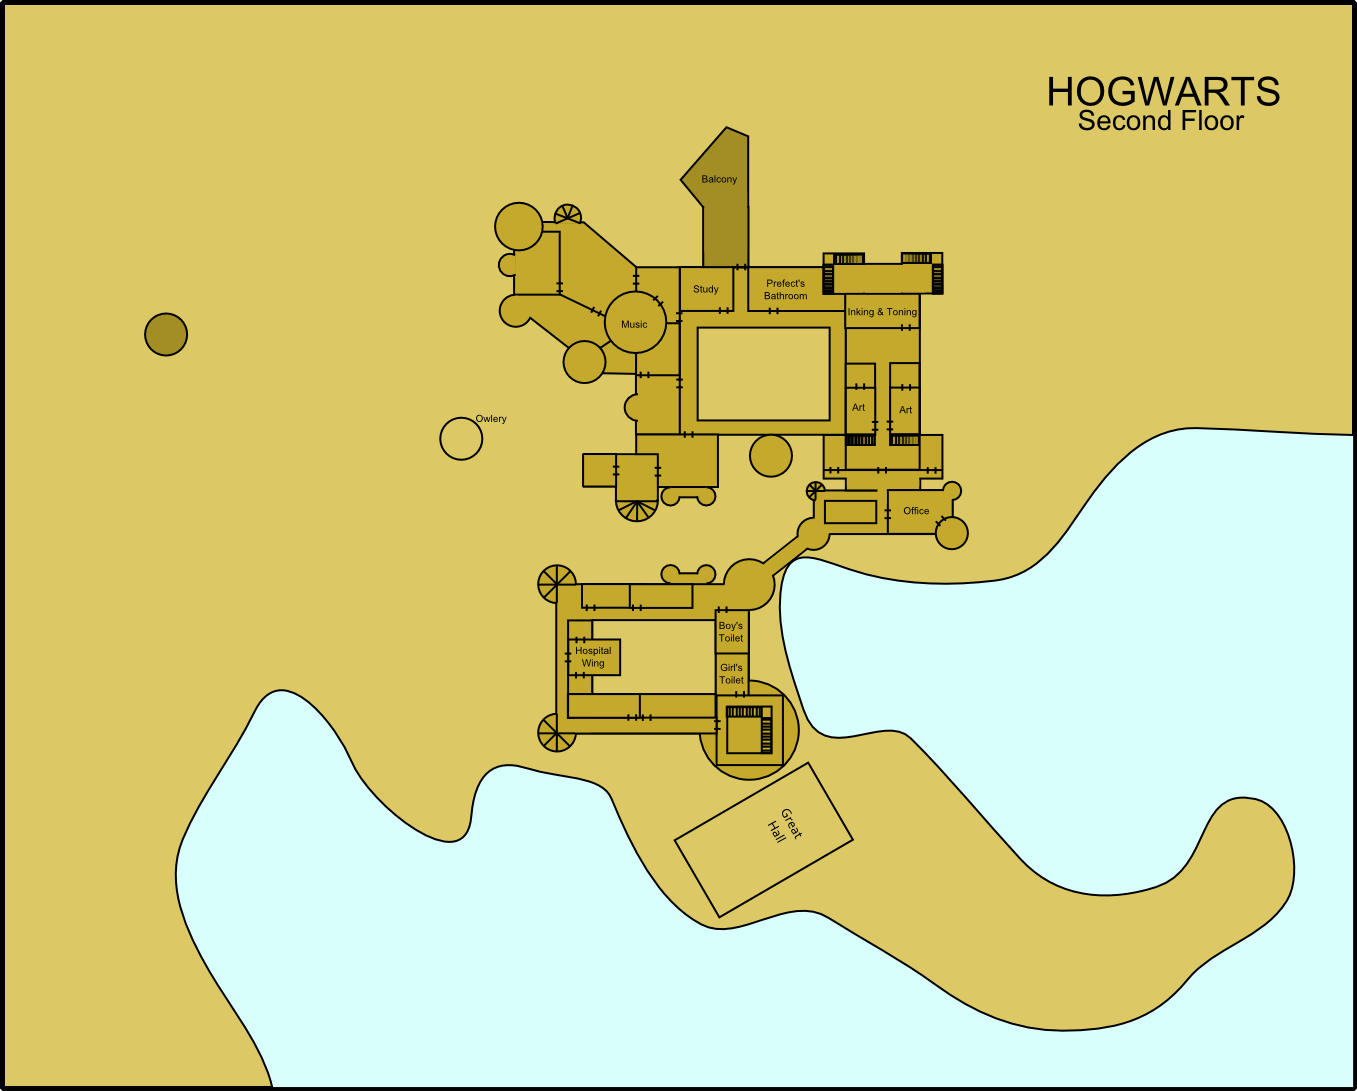 Hogwarts Second Floor